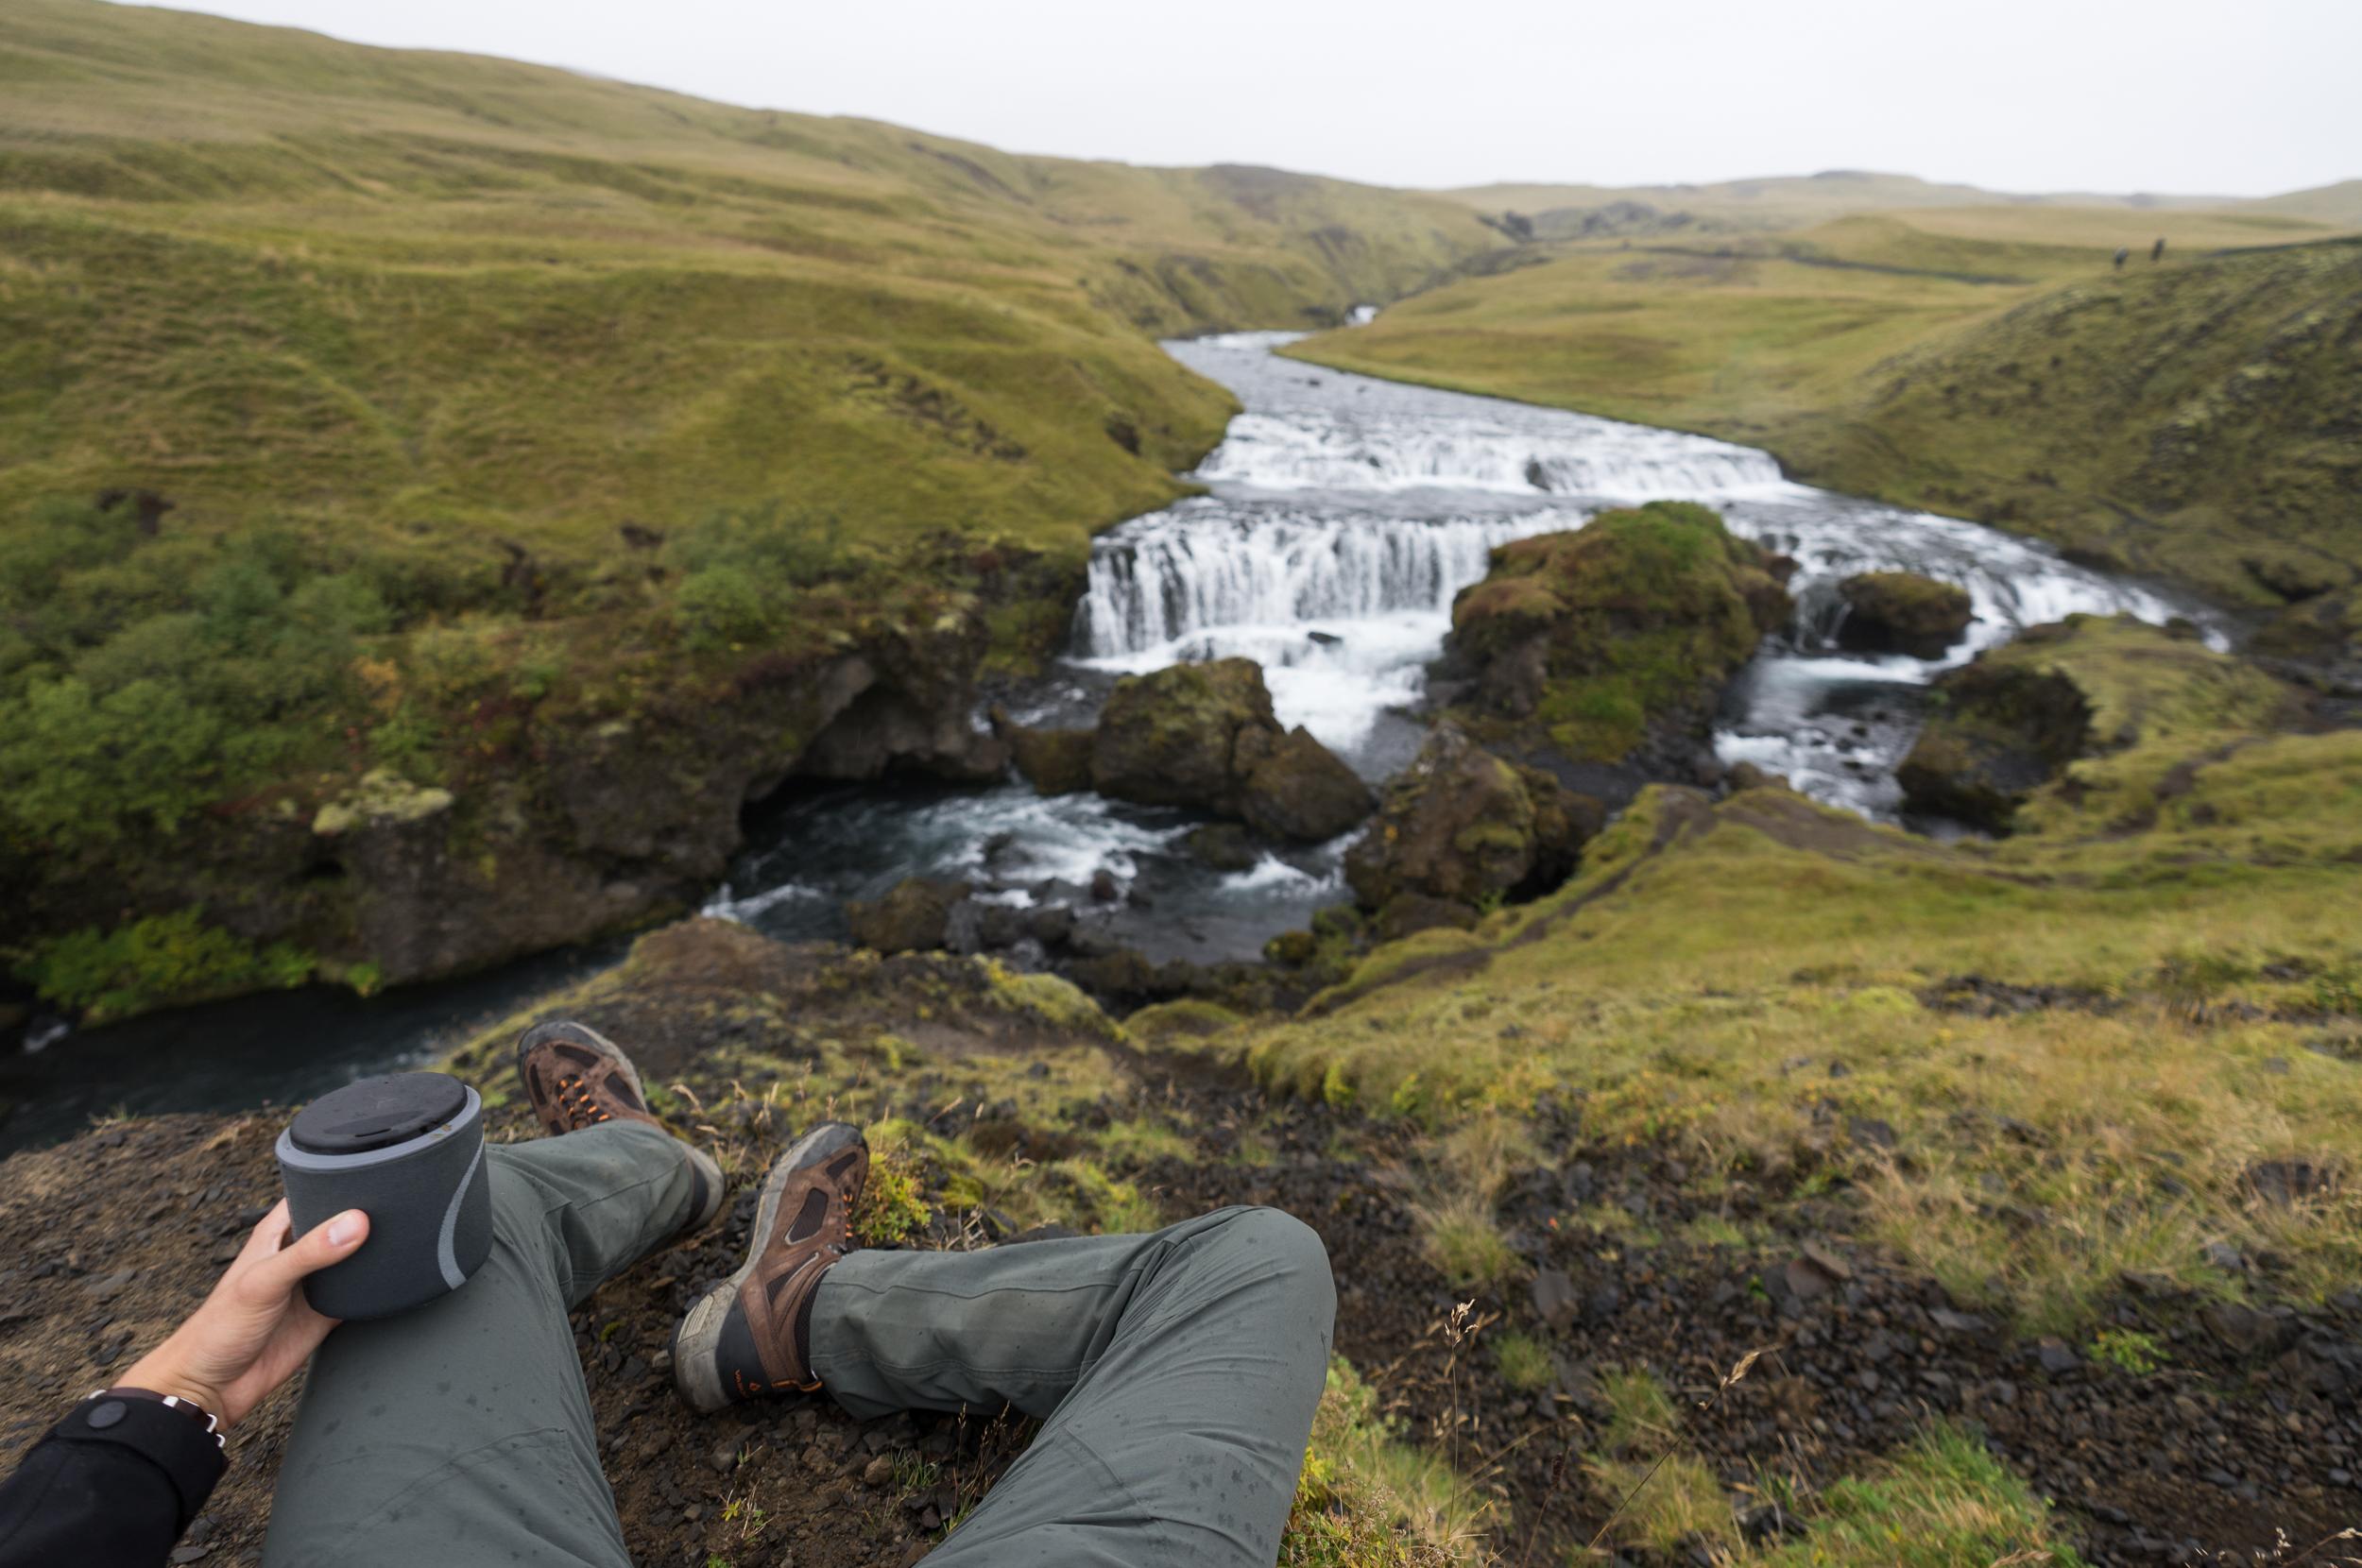 Iceland - 00641 - Chris Goetchius 2017 - WEB UPLOAD ONLY.jpg